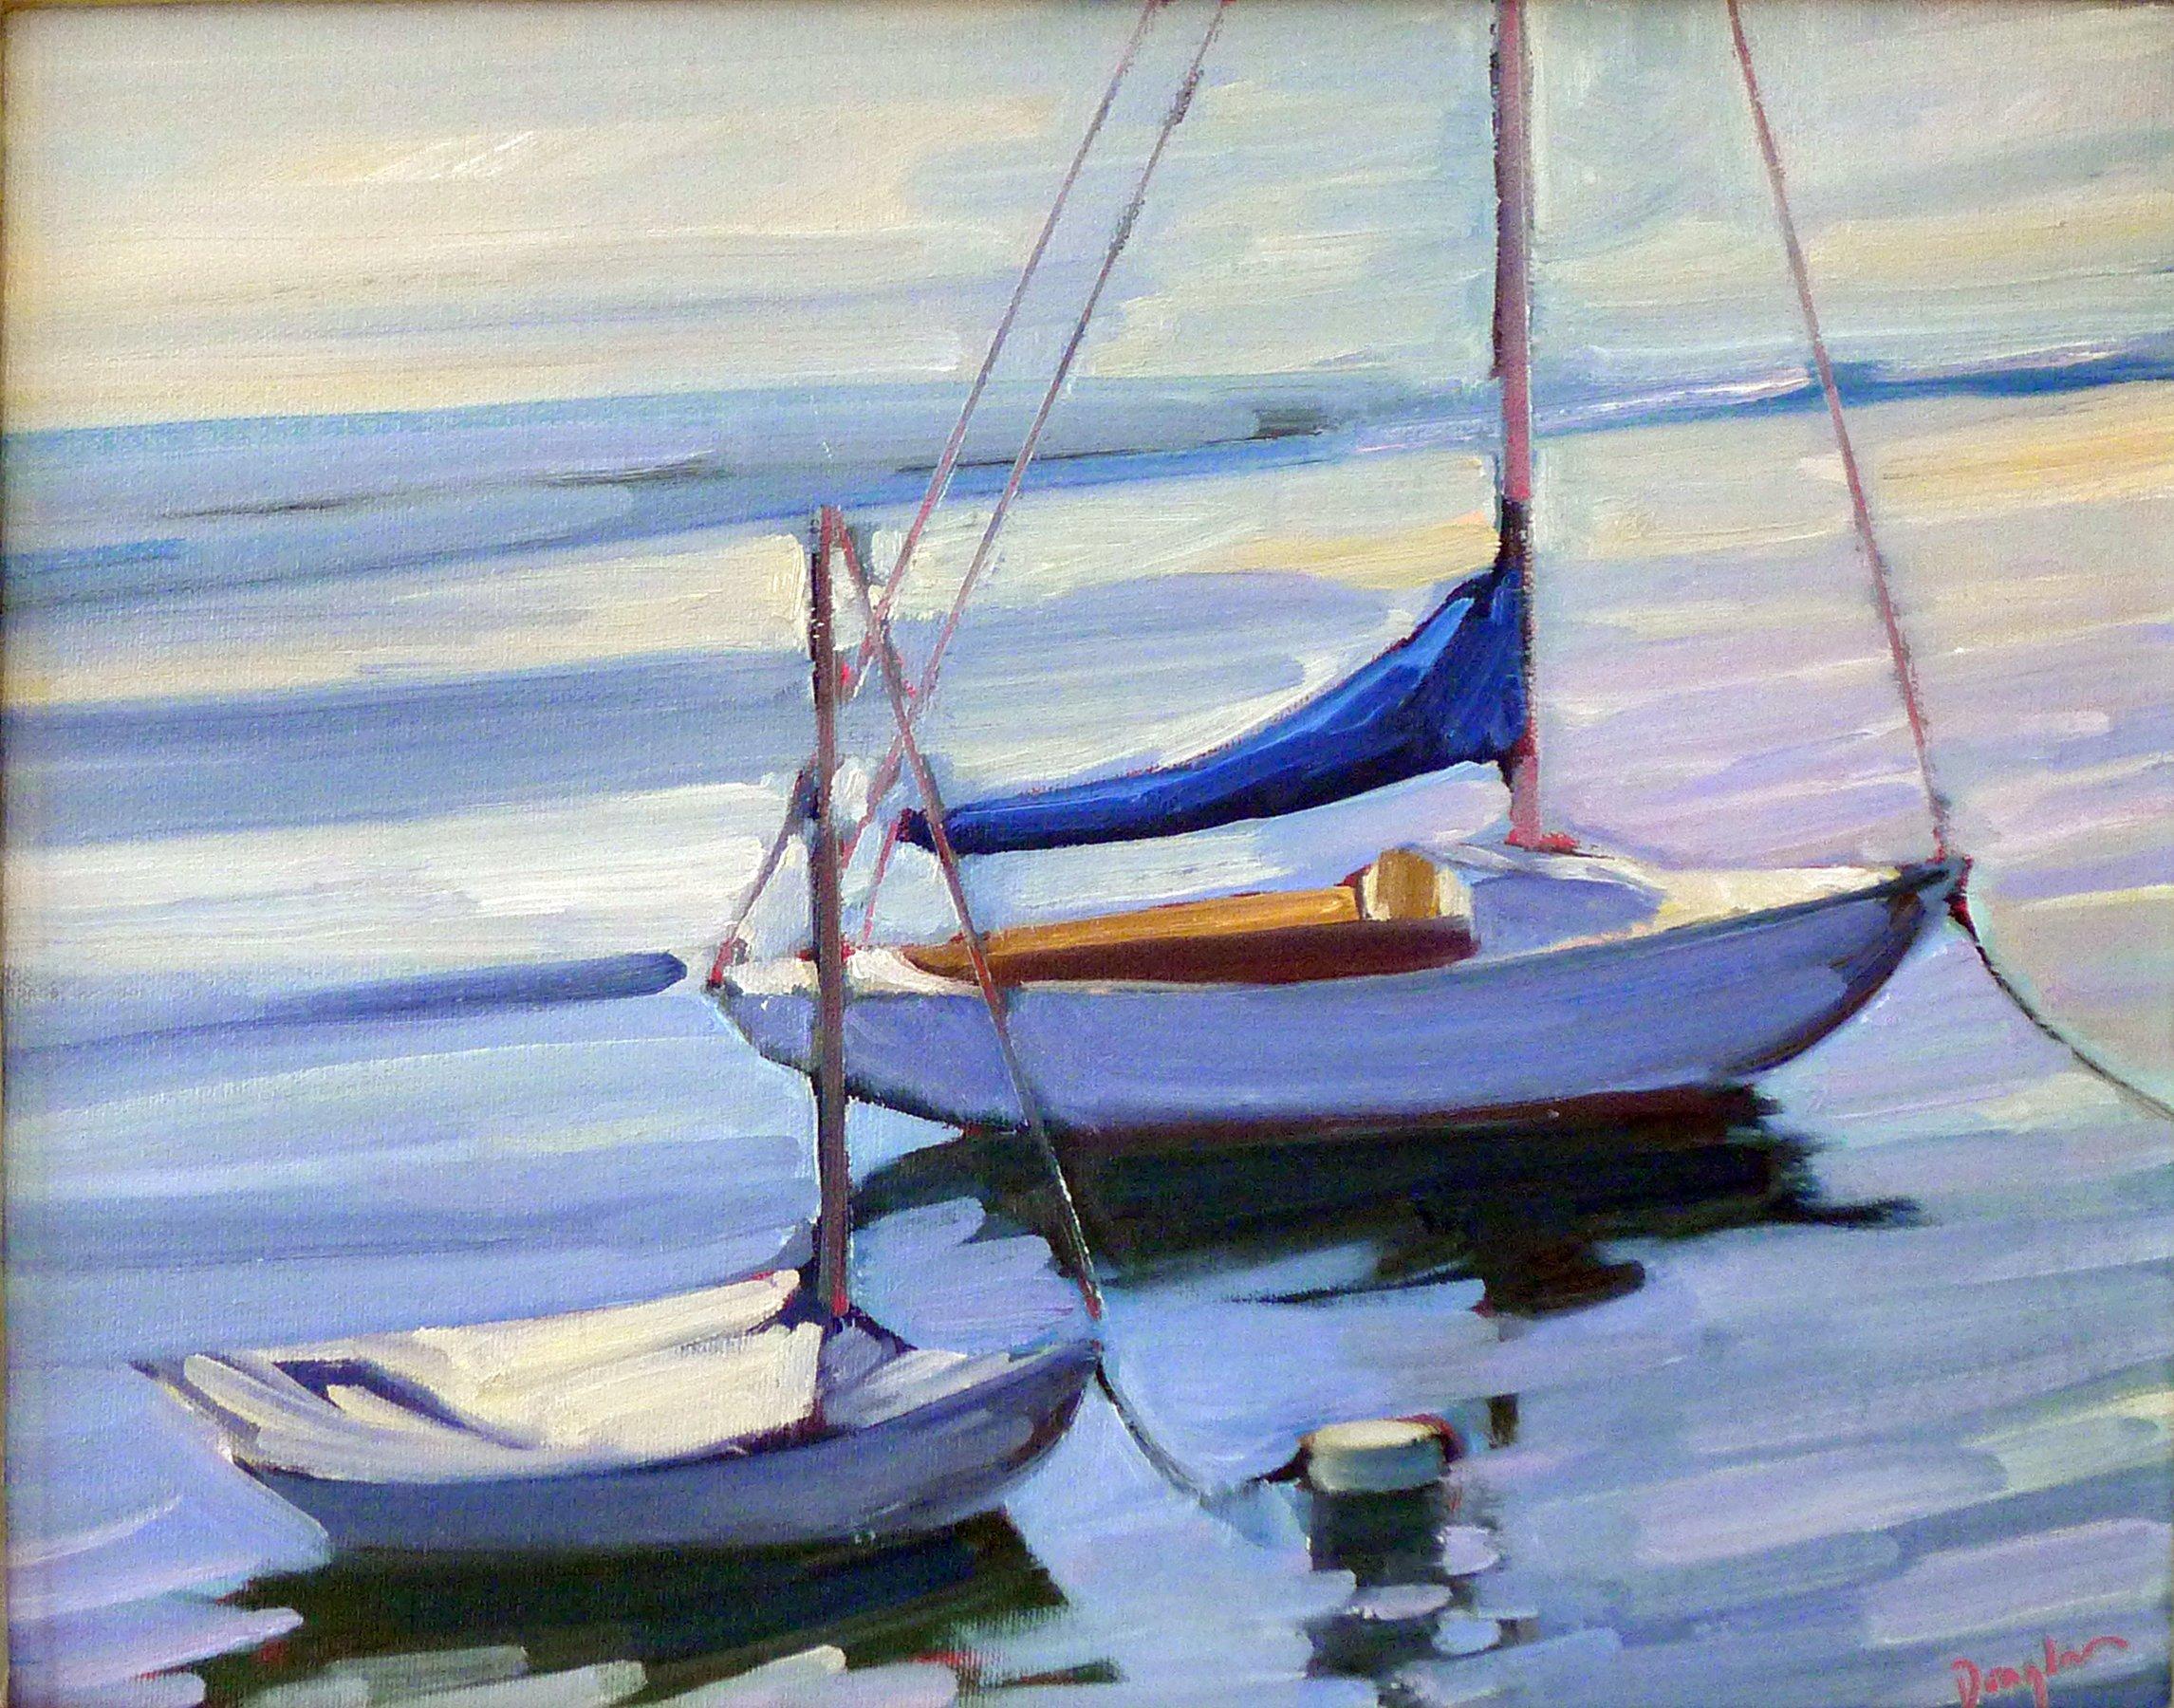 Flood Tide, oil on canvas